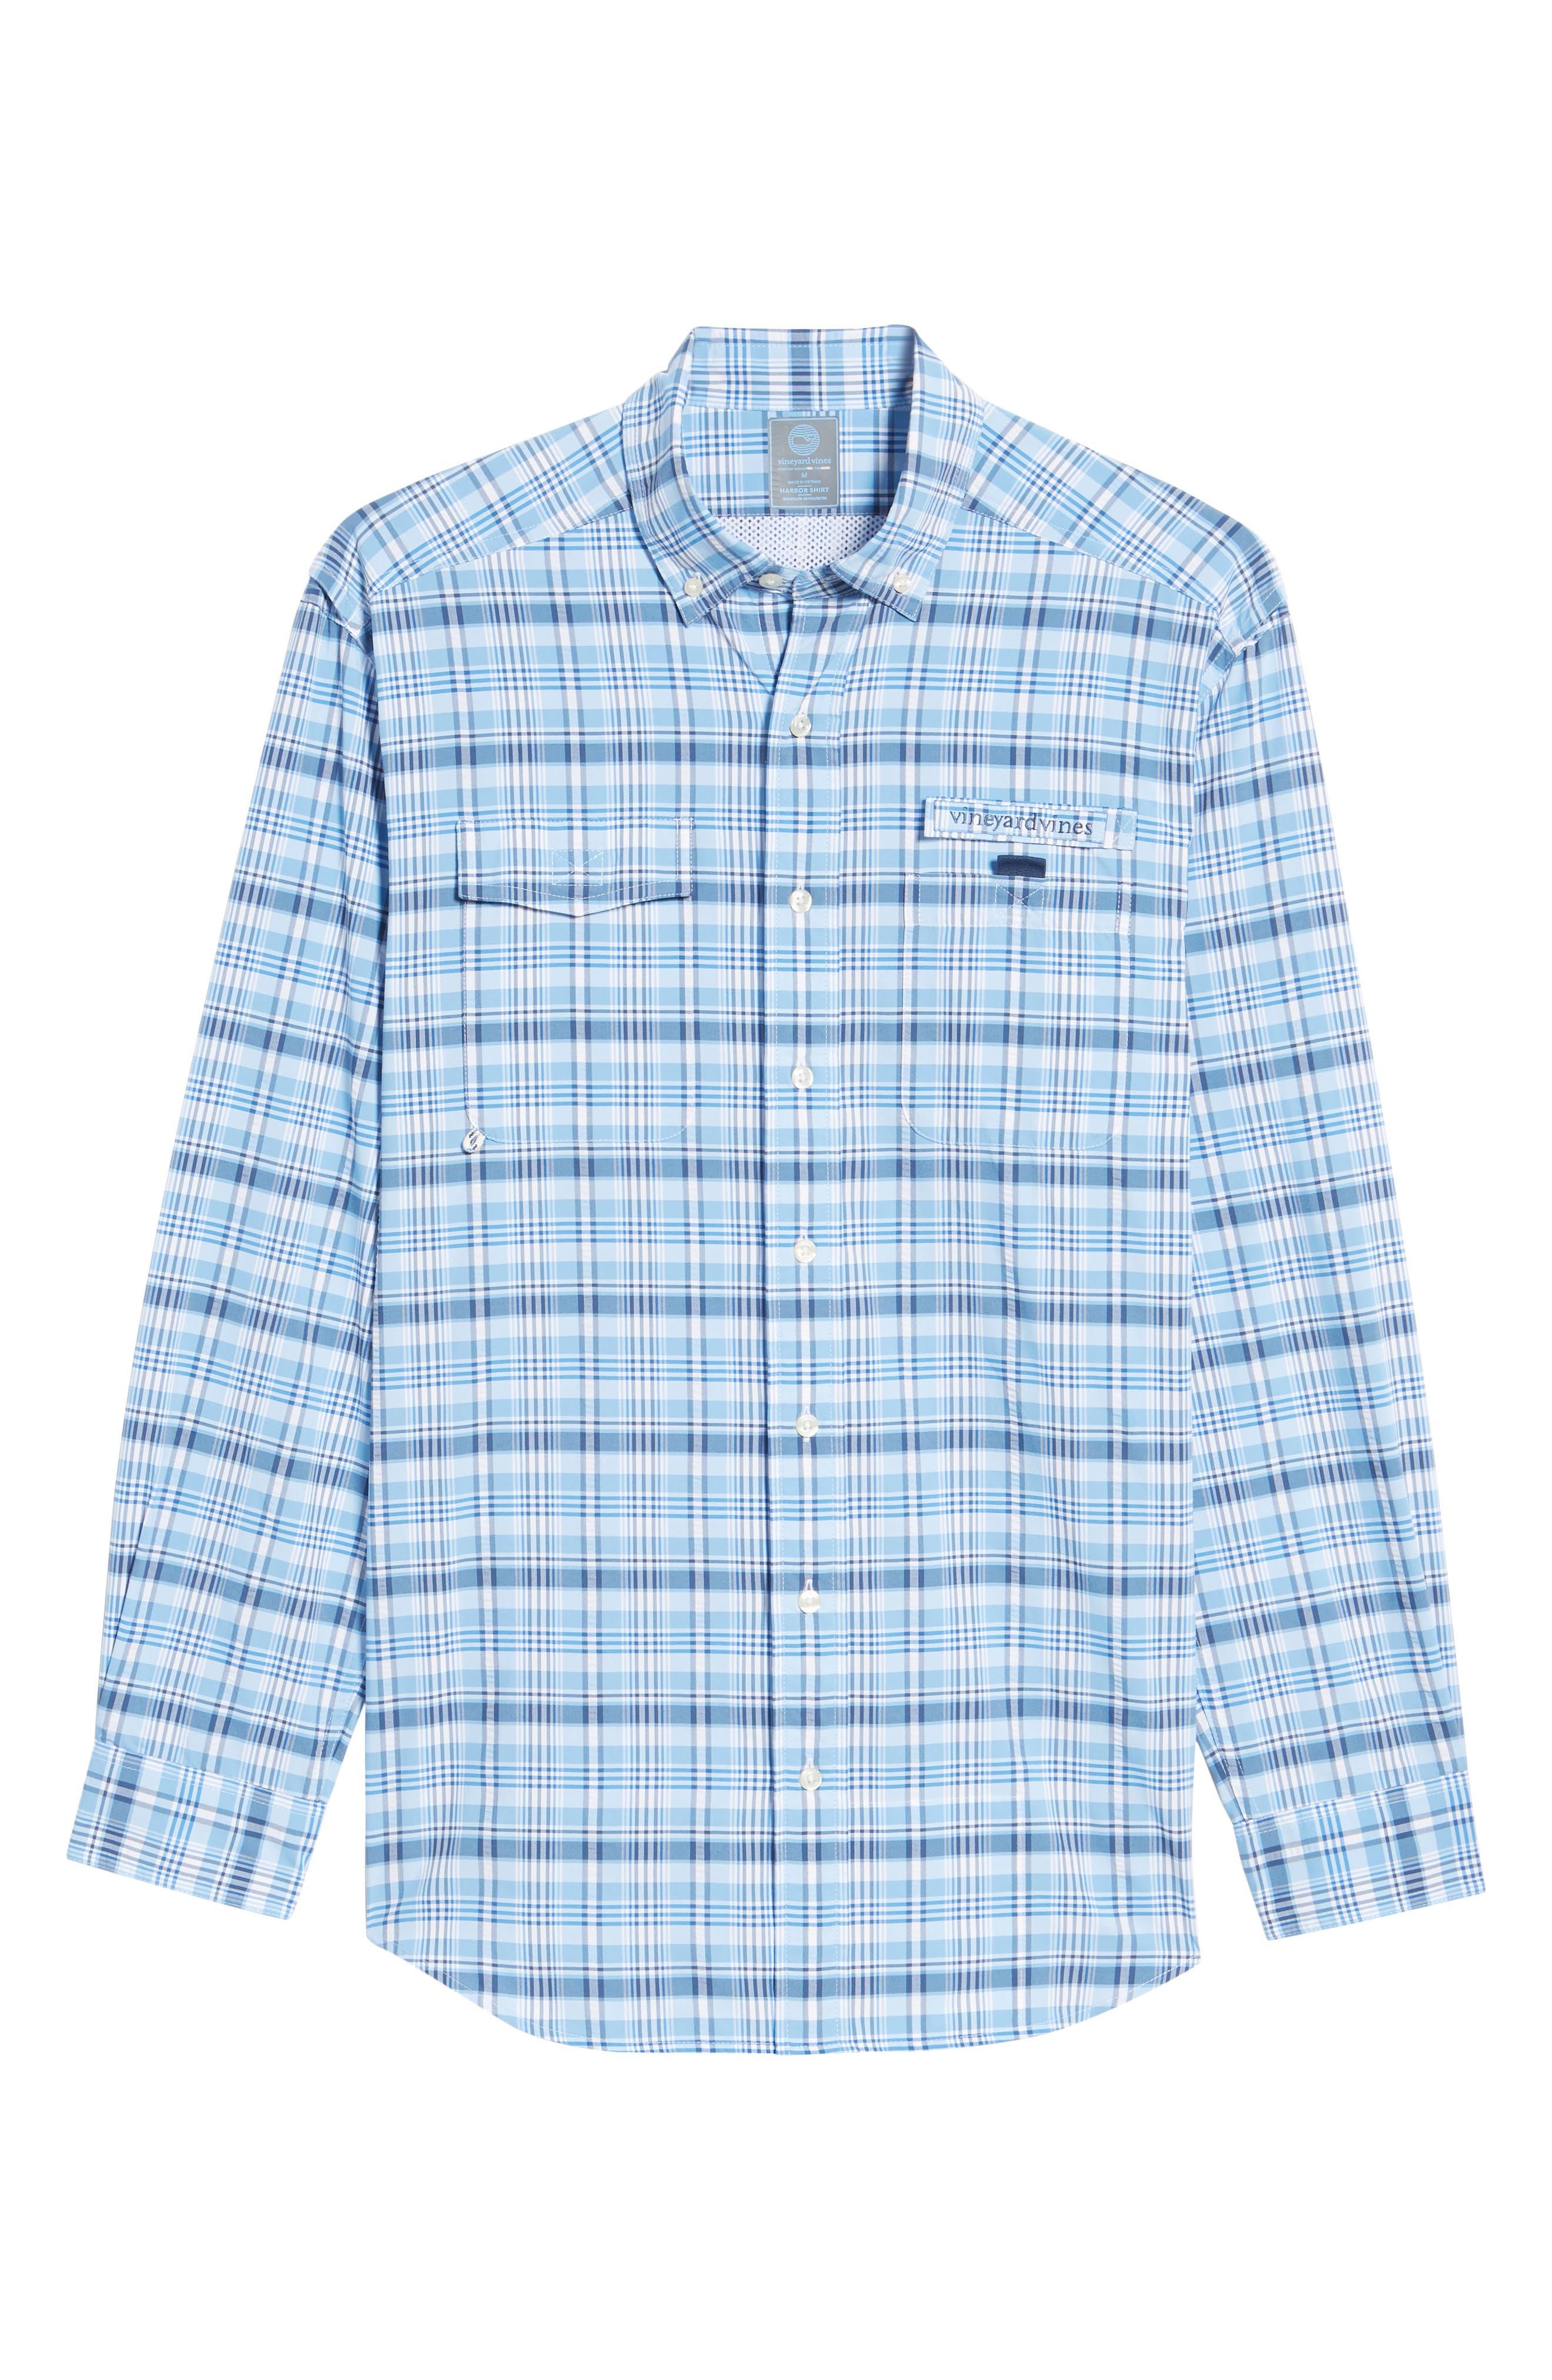 Prospect Hill Harbor Regular Fit Plaid Performance Sport Shirt,                             Alternate thumbnail 6, color,                             Ocean Breeze